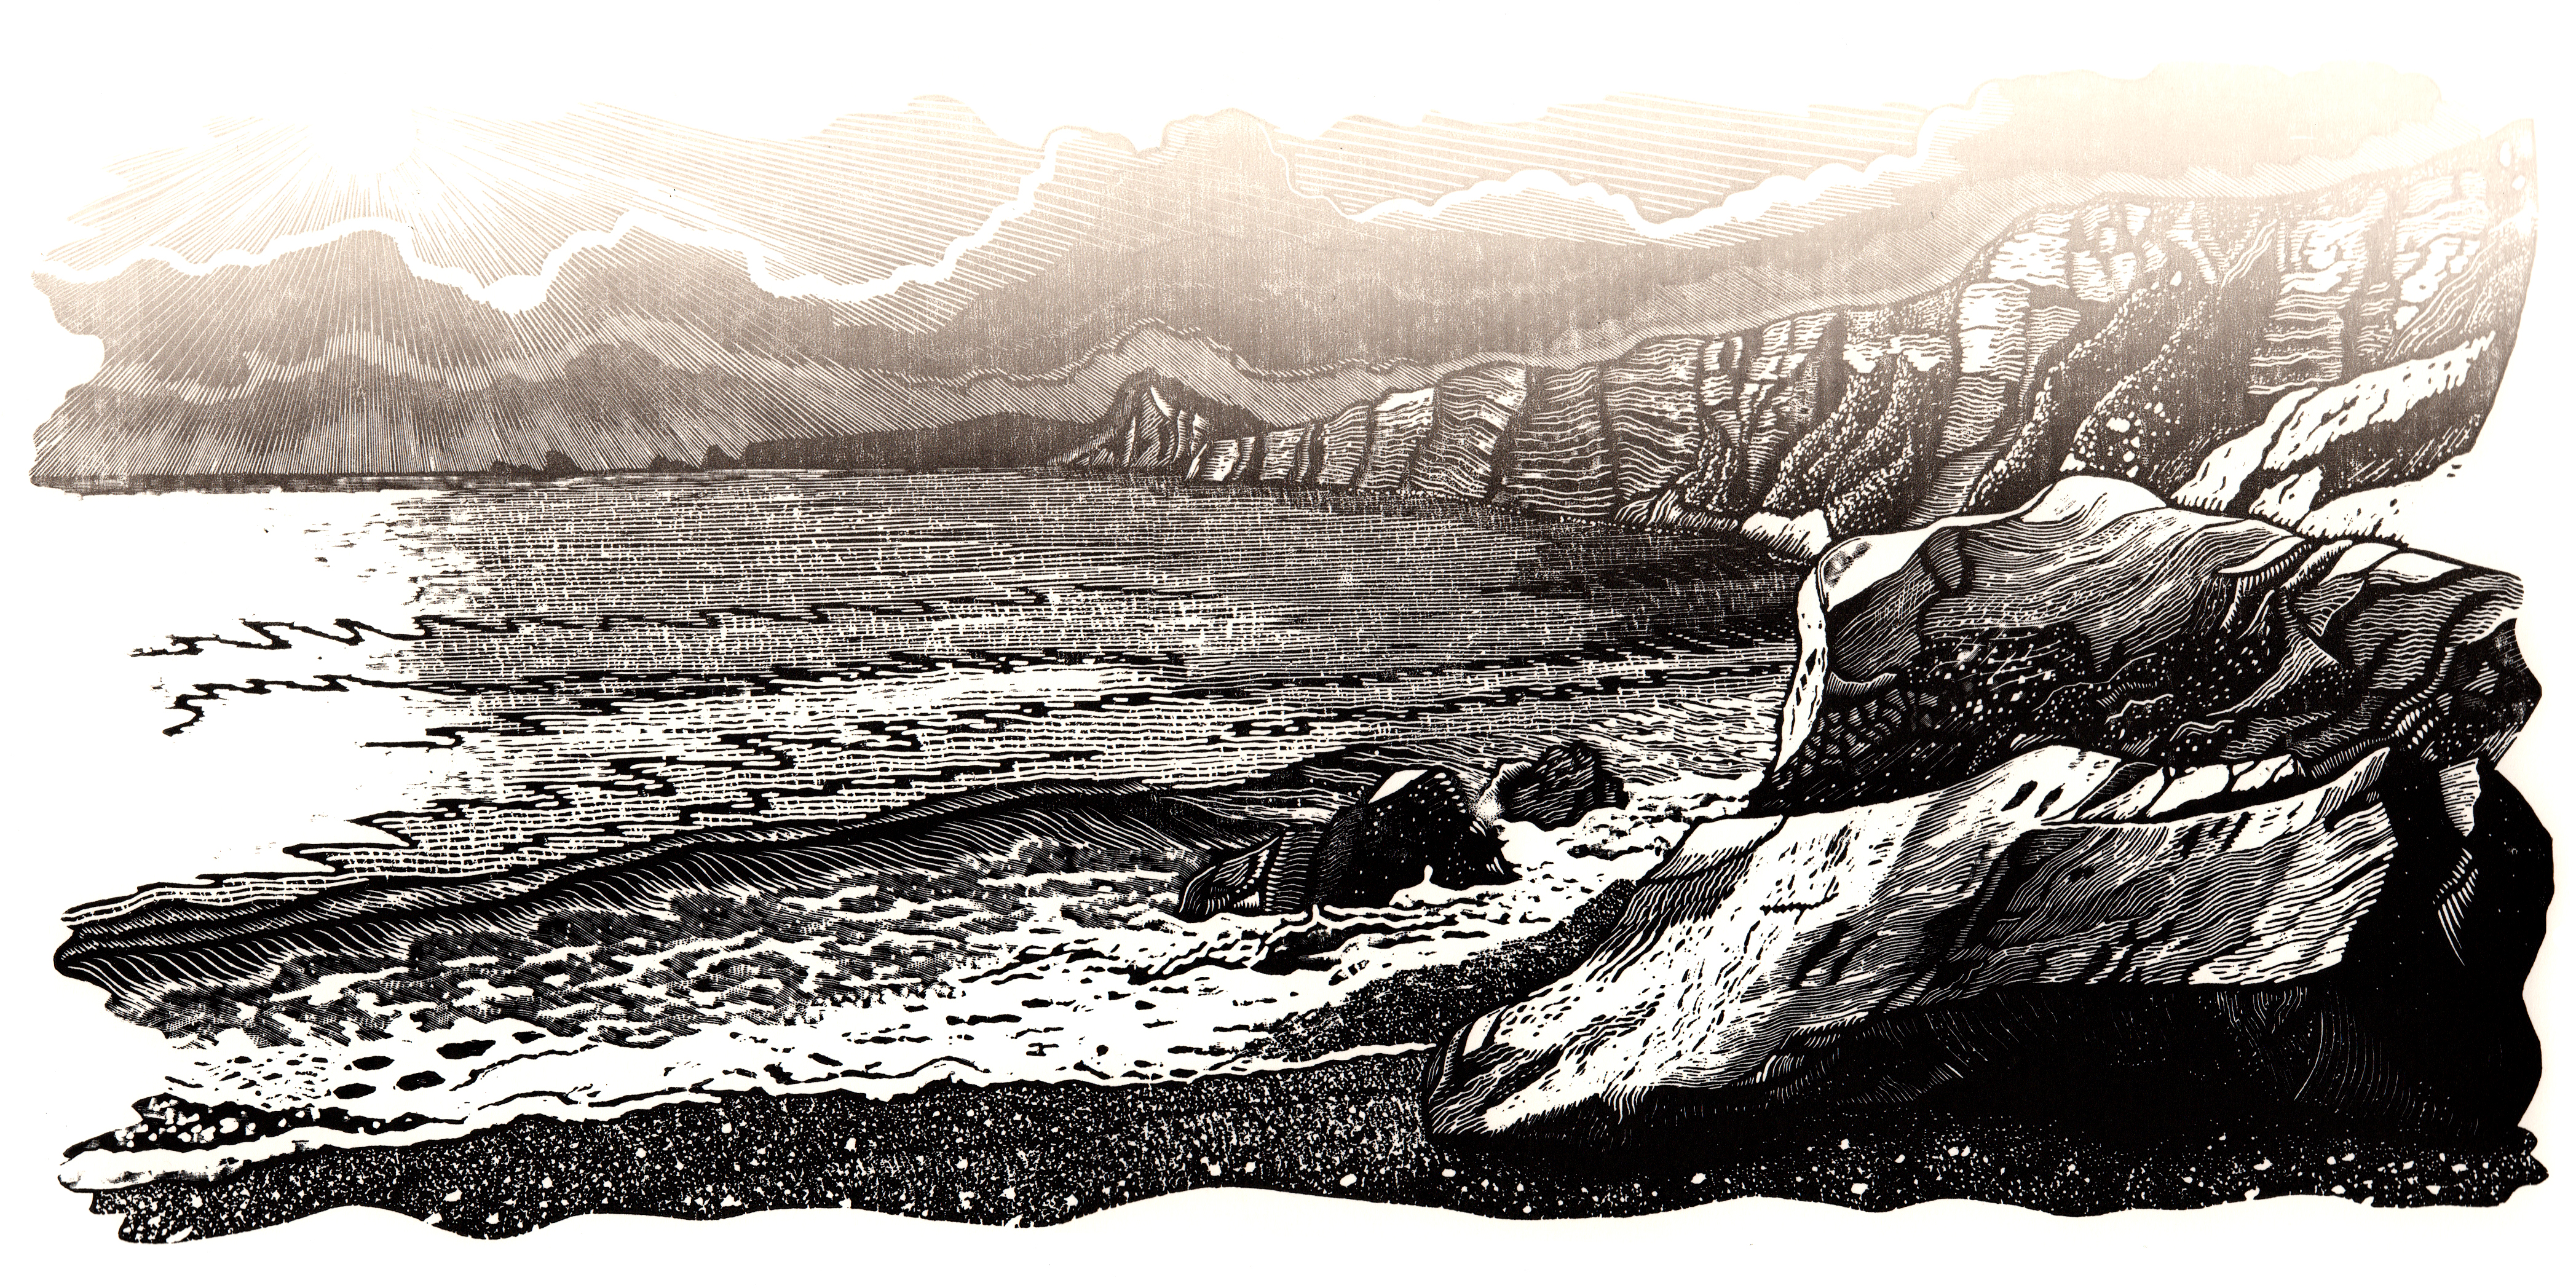 Tyneham, 2018. Wood engraving block print, Robin Mackenzie